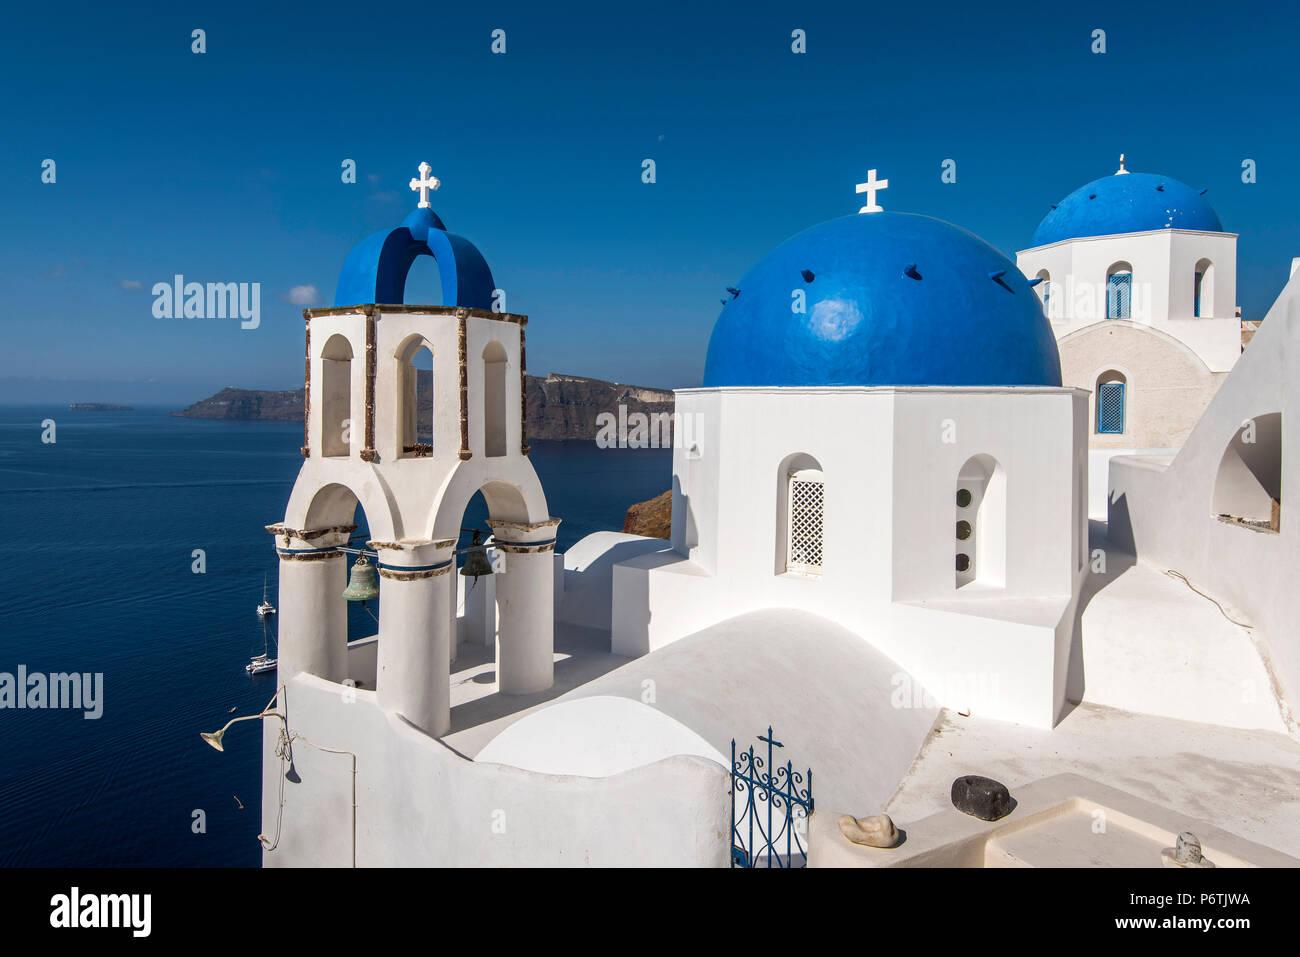 Greek orthodox church with blue domes in Oia, Santorini, South Aegean, Greece - Stock Image